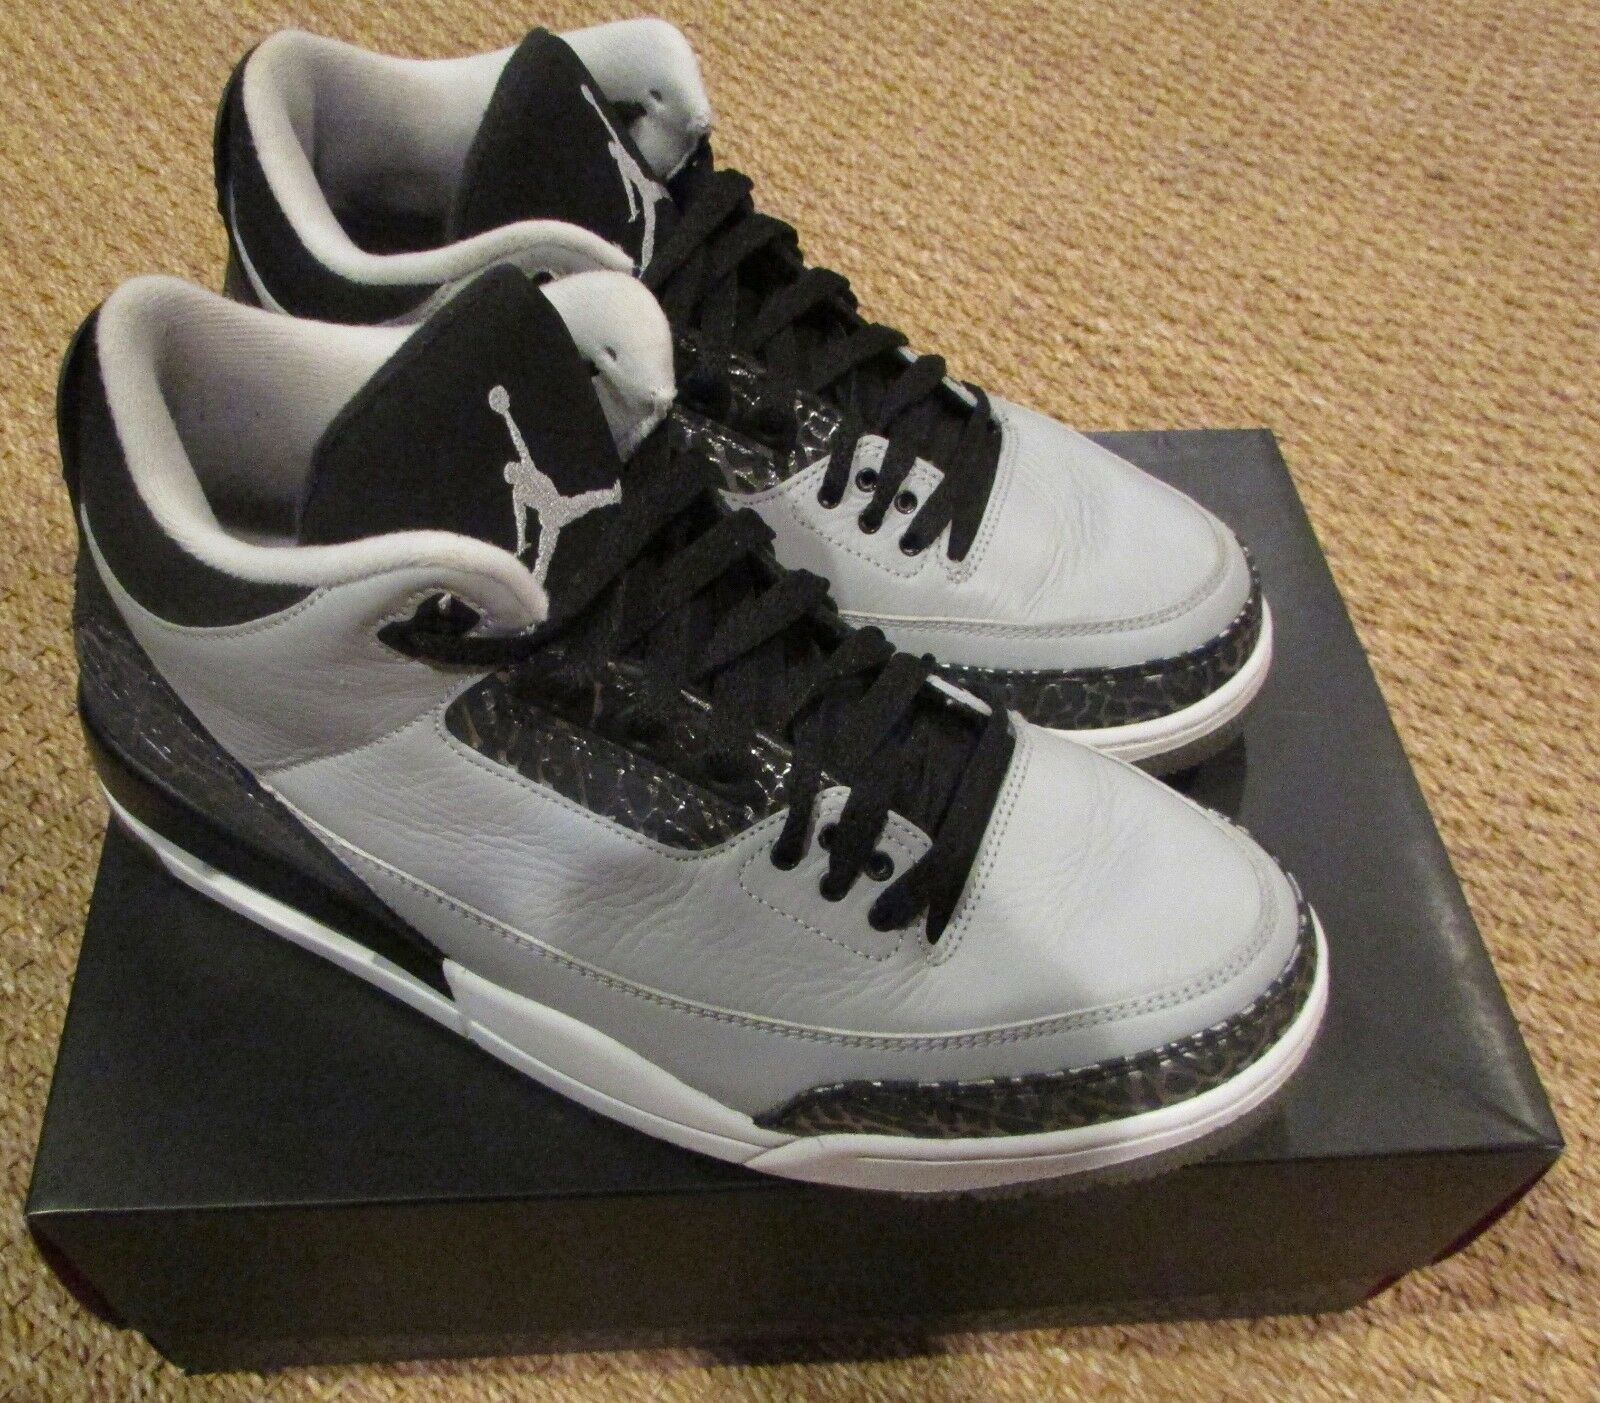 Air Jordan 3 Retro Wolf Grey Size 10 in Original Box 136064-004